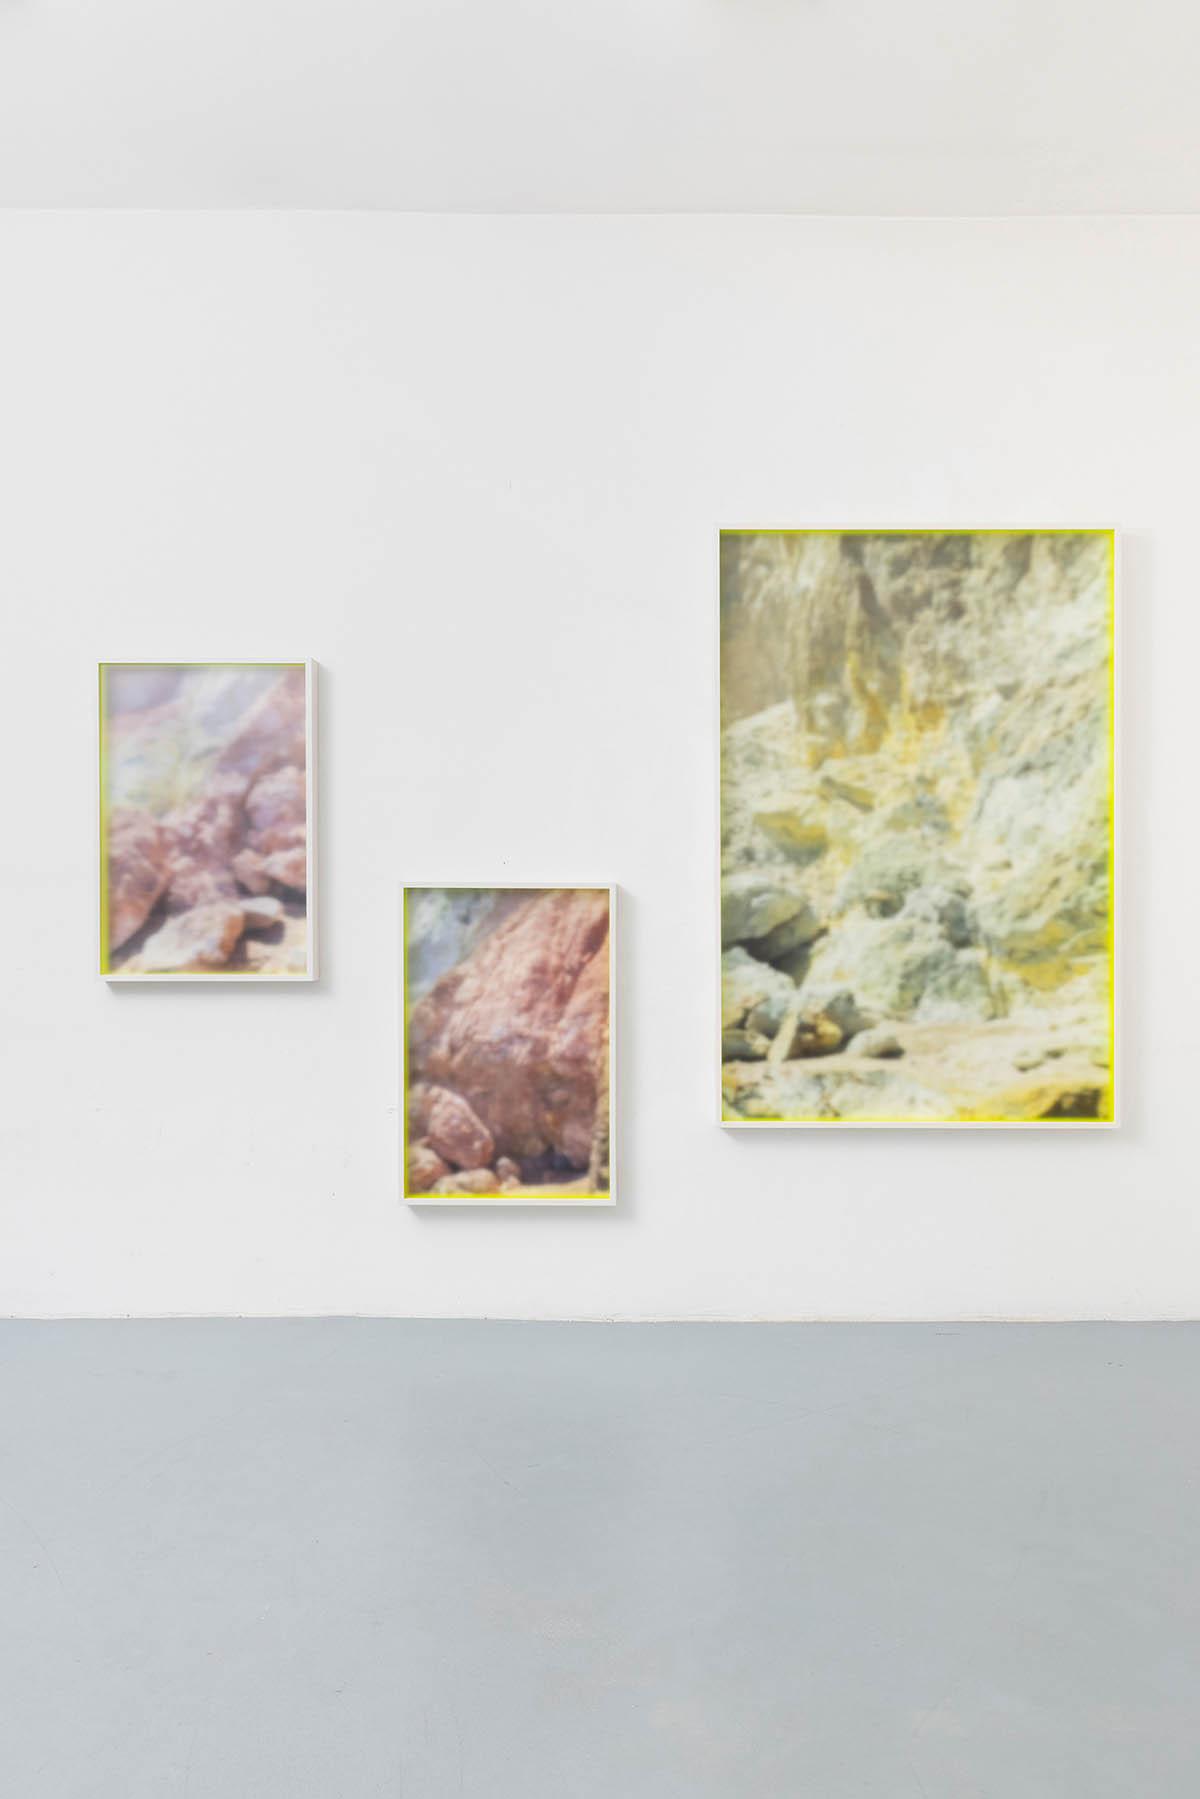 Mario Kiesenhofer | Island – Paleochori Beach, Milos | Pigment Prints, Neon Acrylfarbe auf Distanzleiste, gerahmt hinter satiniertem Plexiglas | Dimensionen variabel | 2019/21 | Studio View | © Bildrecht Wien 2020